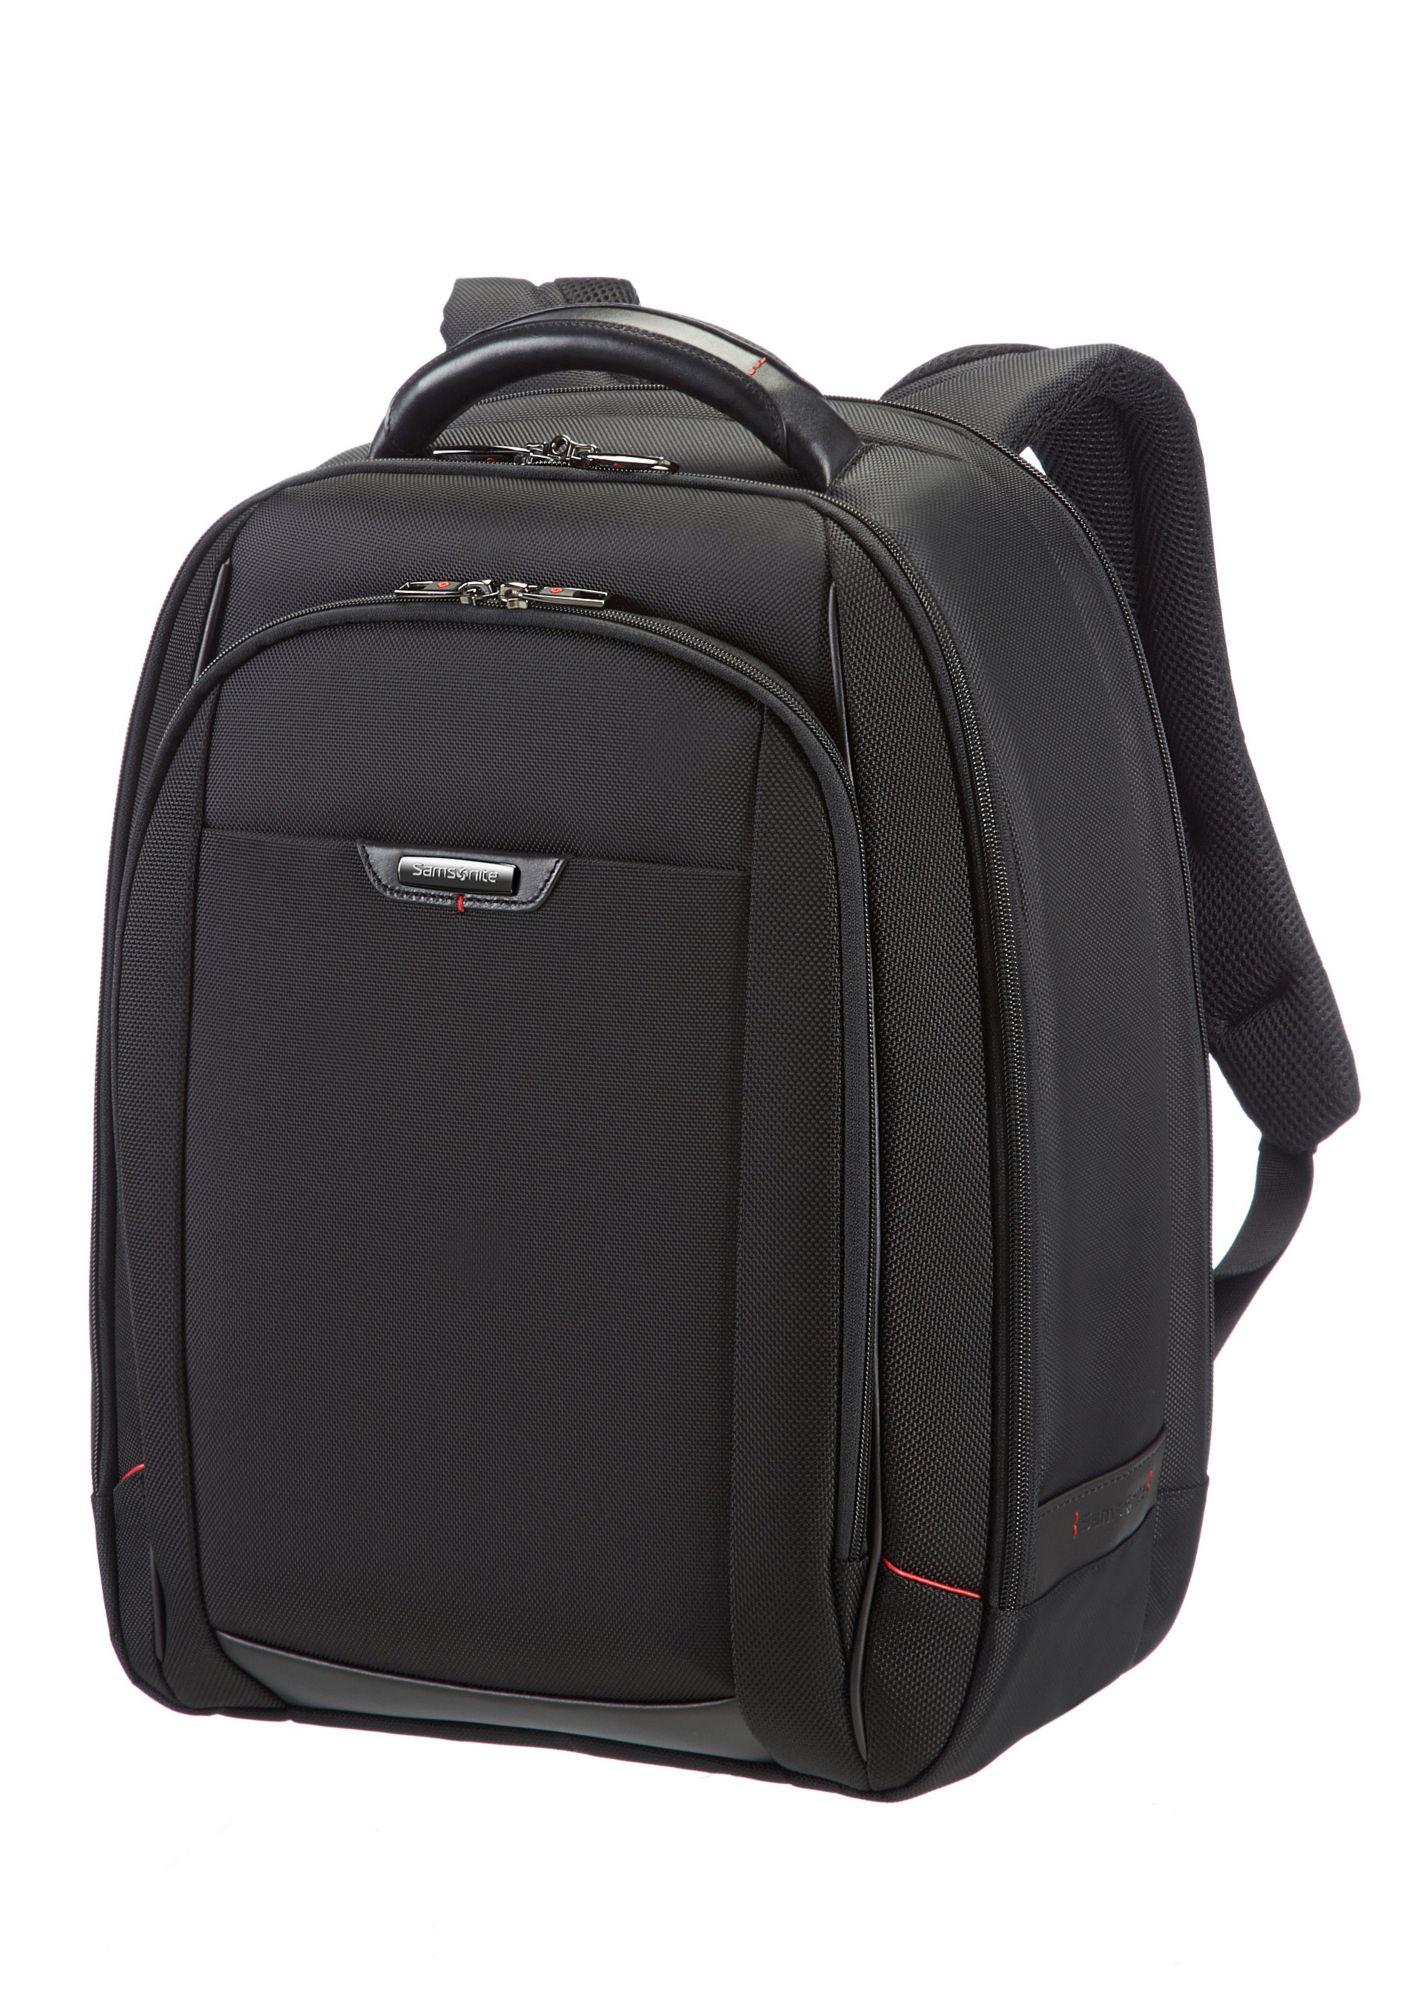 SAMSONITE Pro-DLX 4 Business Rucksack 48 cm Laptopfach Samsonite black